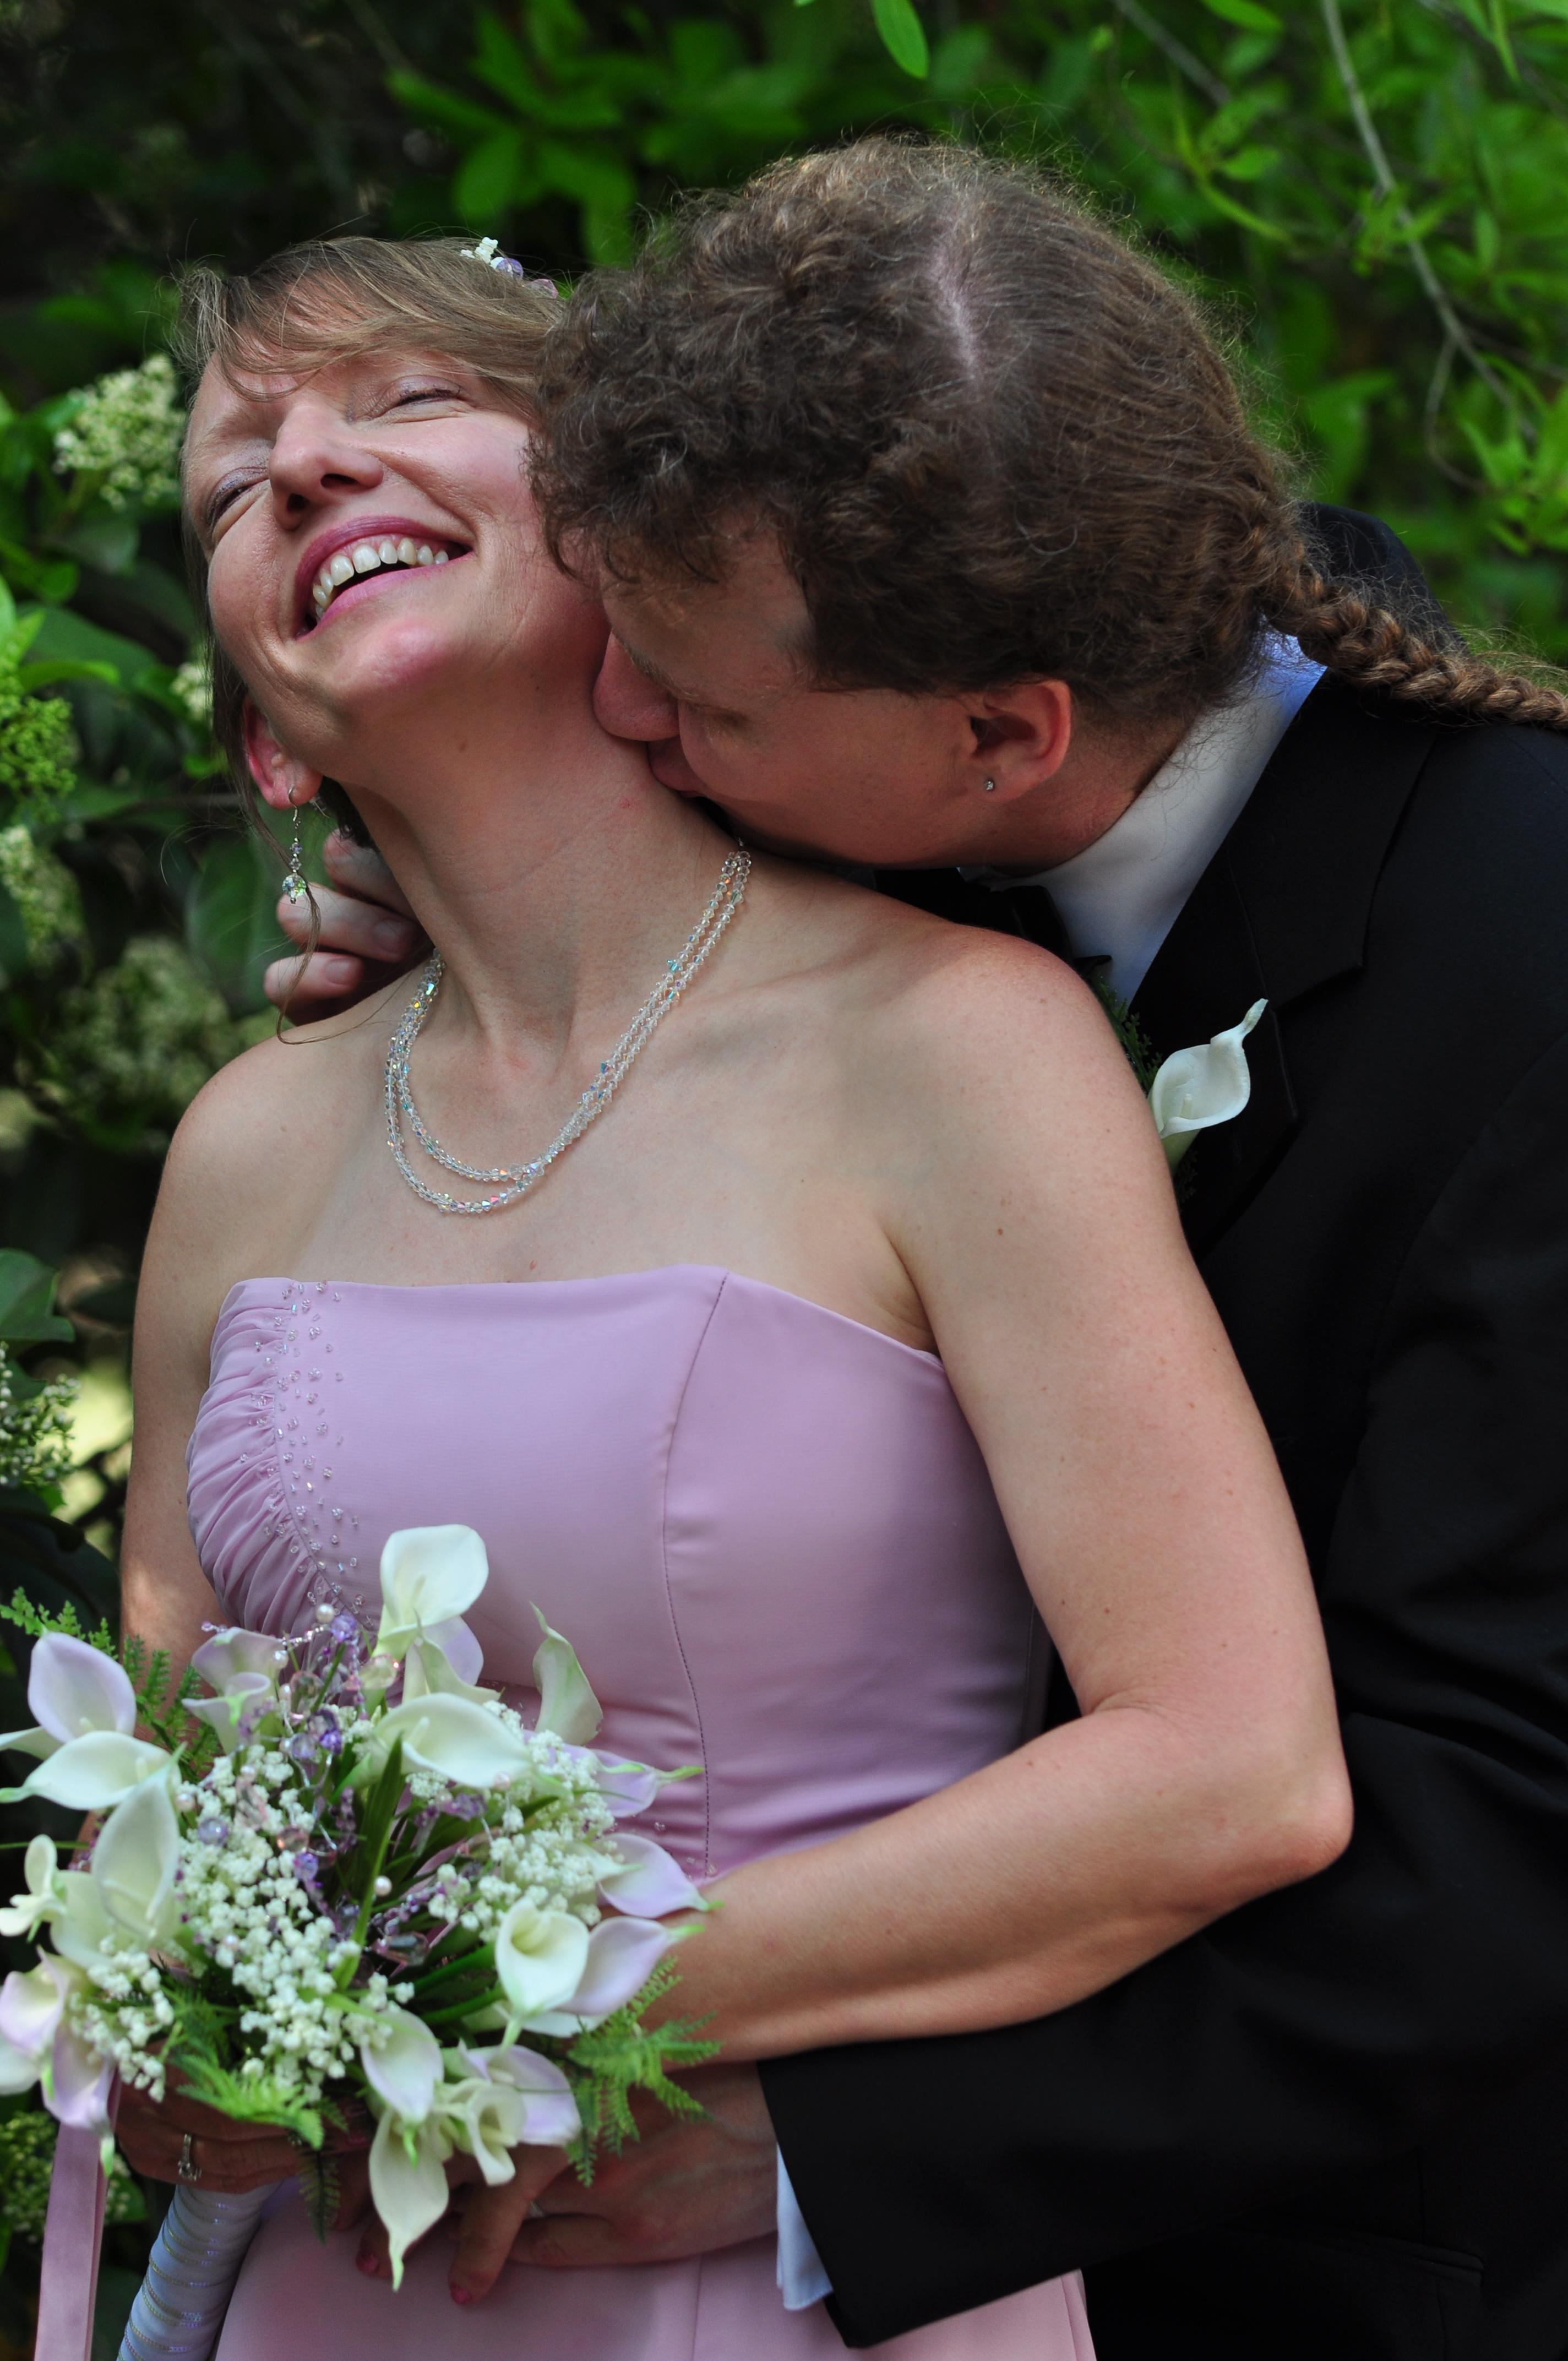 emily-and-travis-4-1-2013-april-fools-wedding-334